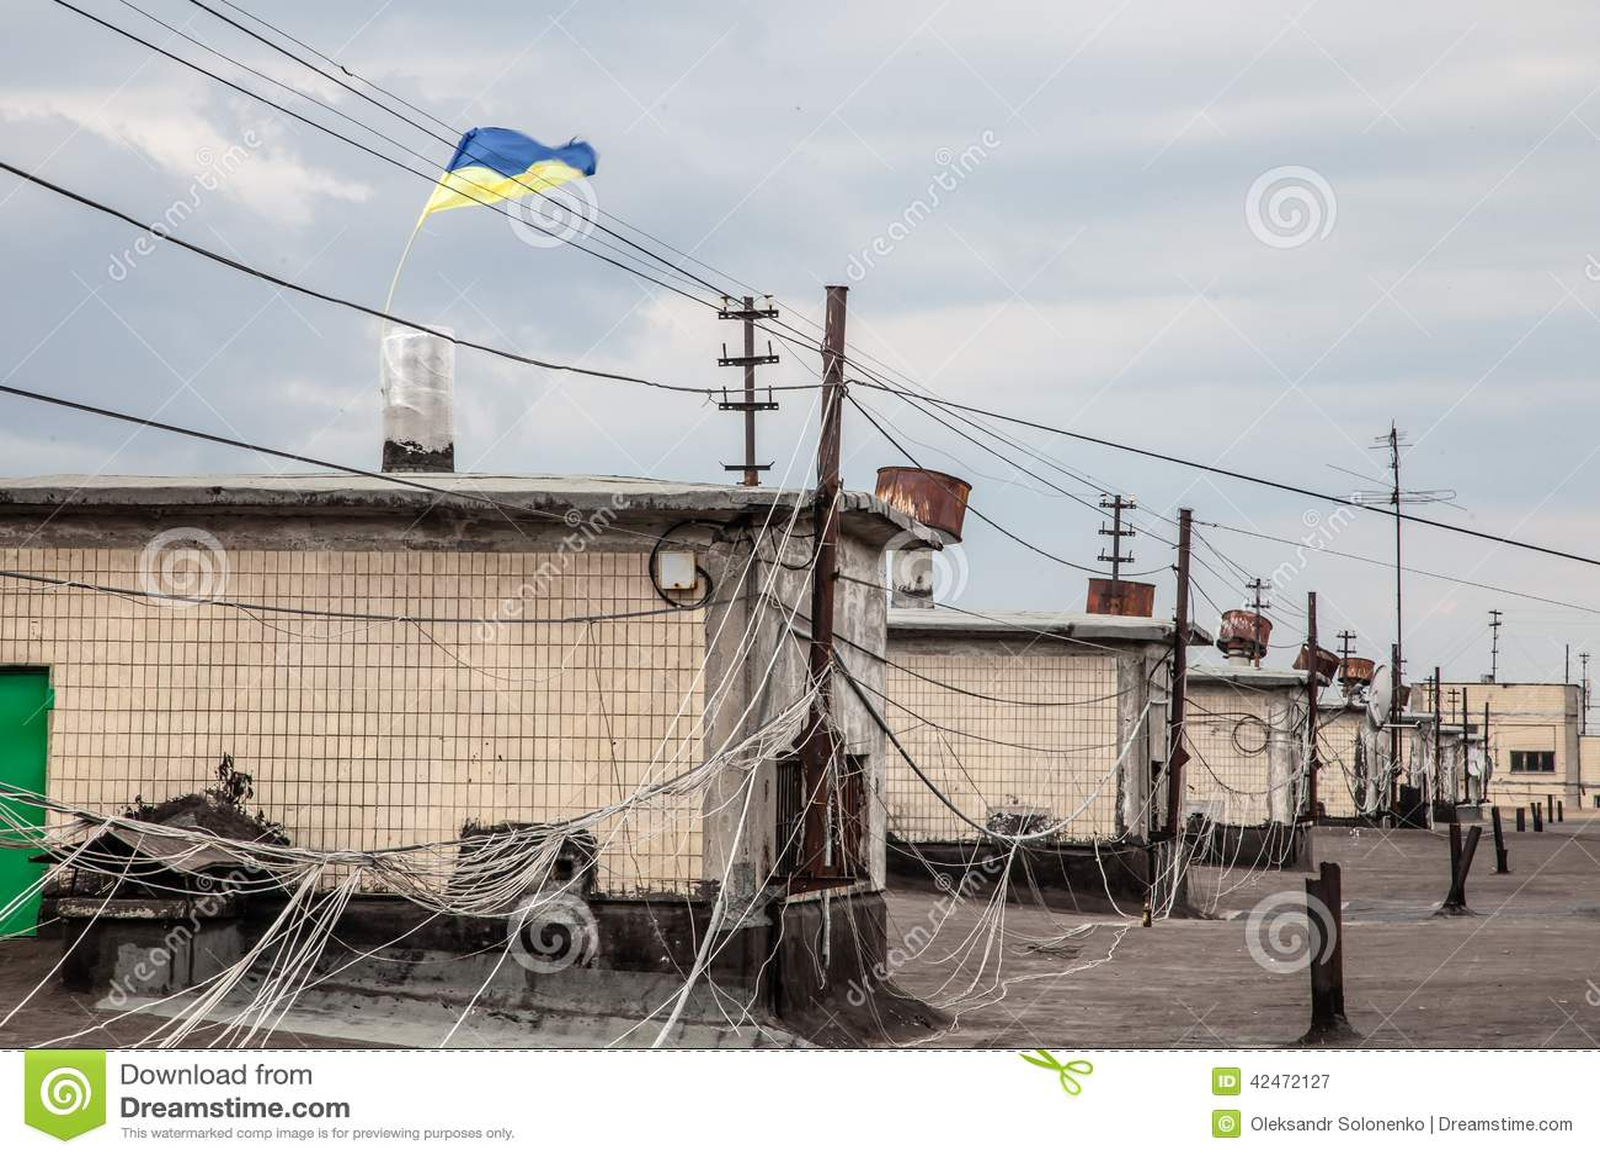 Dachspitze der Wohnung buiding mit MA-Flagge